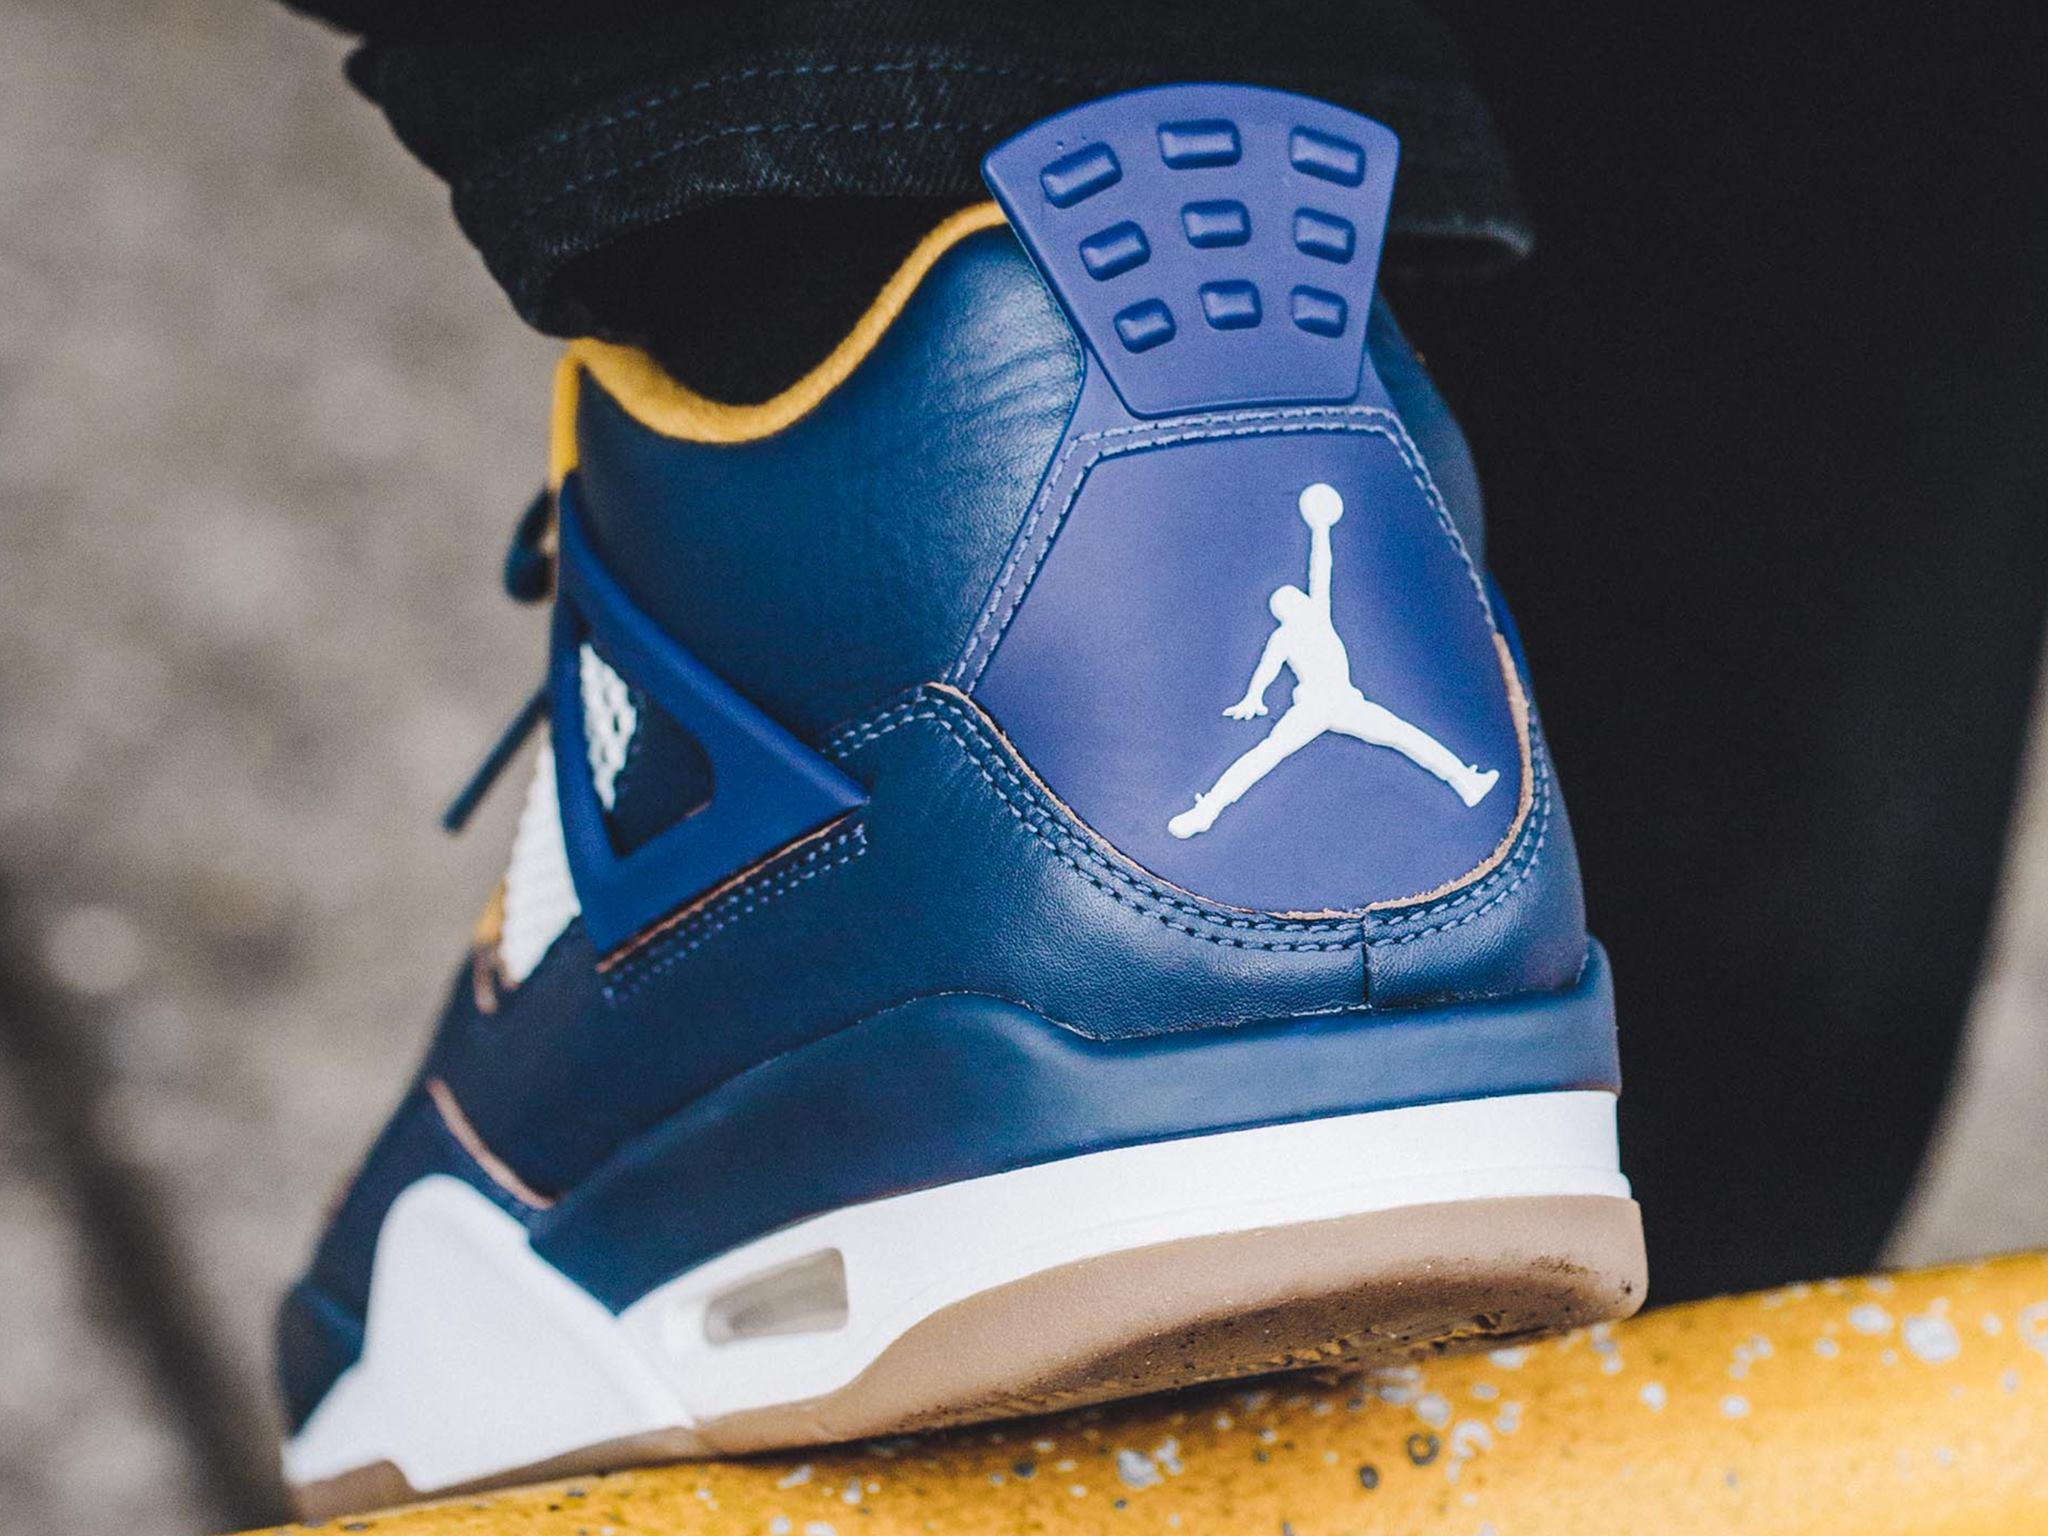 sale retailer 6c21e 7b2e9 Air Jordan 4 Dunk From Above • KicksOnFire.com